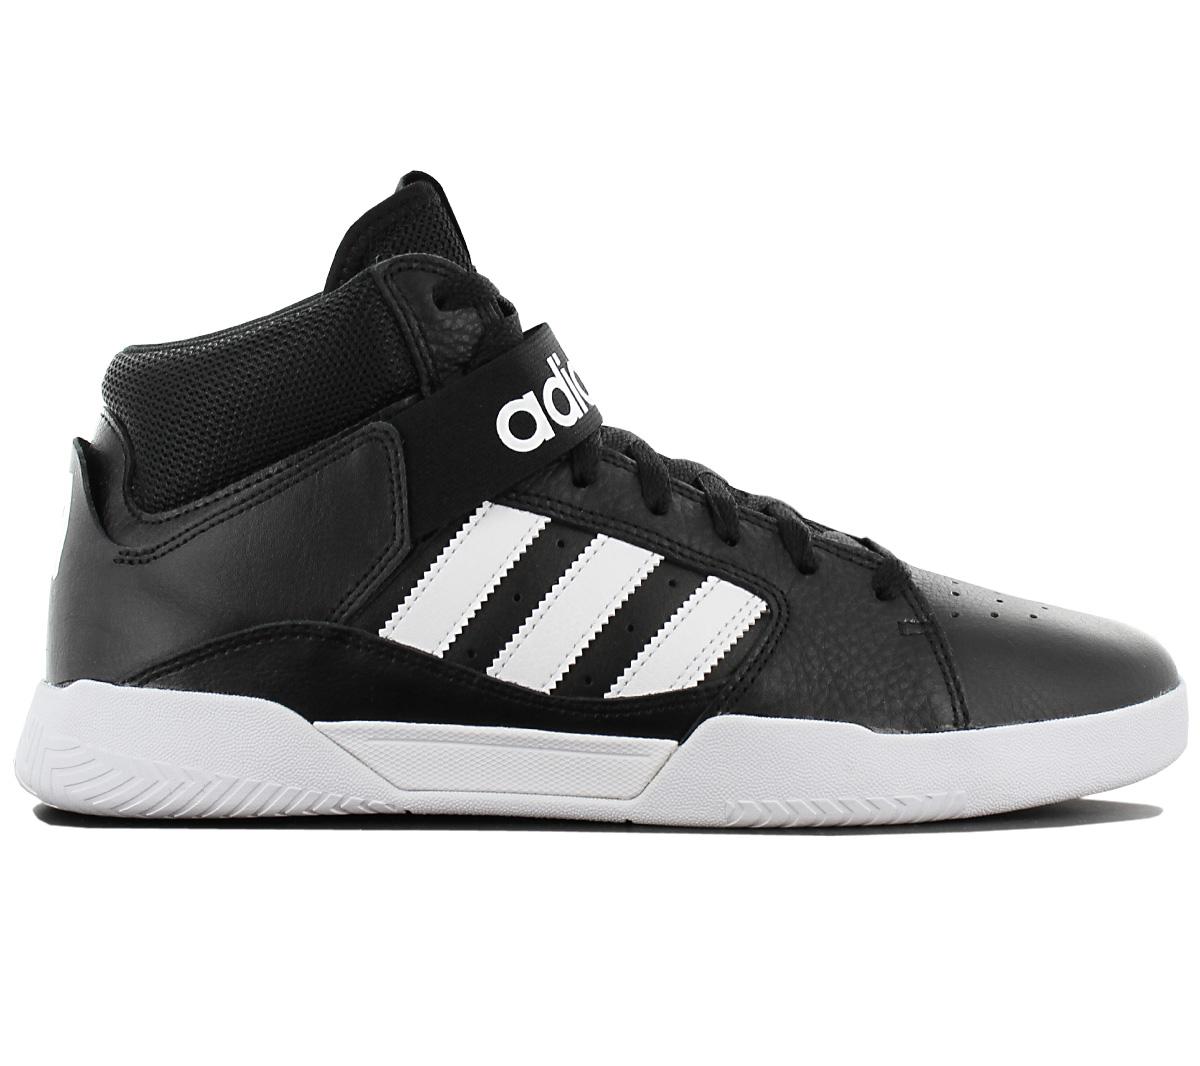 Details about Adidas Originals Vrx Cup mid Men's Sneaker Shoes Skate Shoes Black B41479